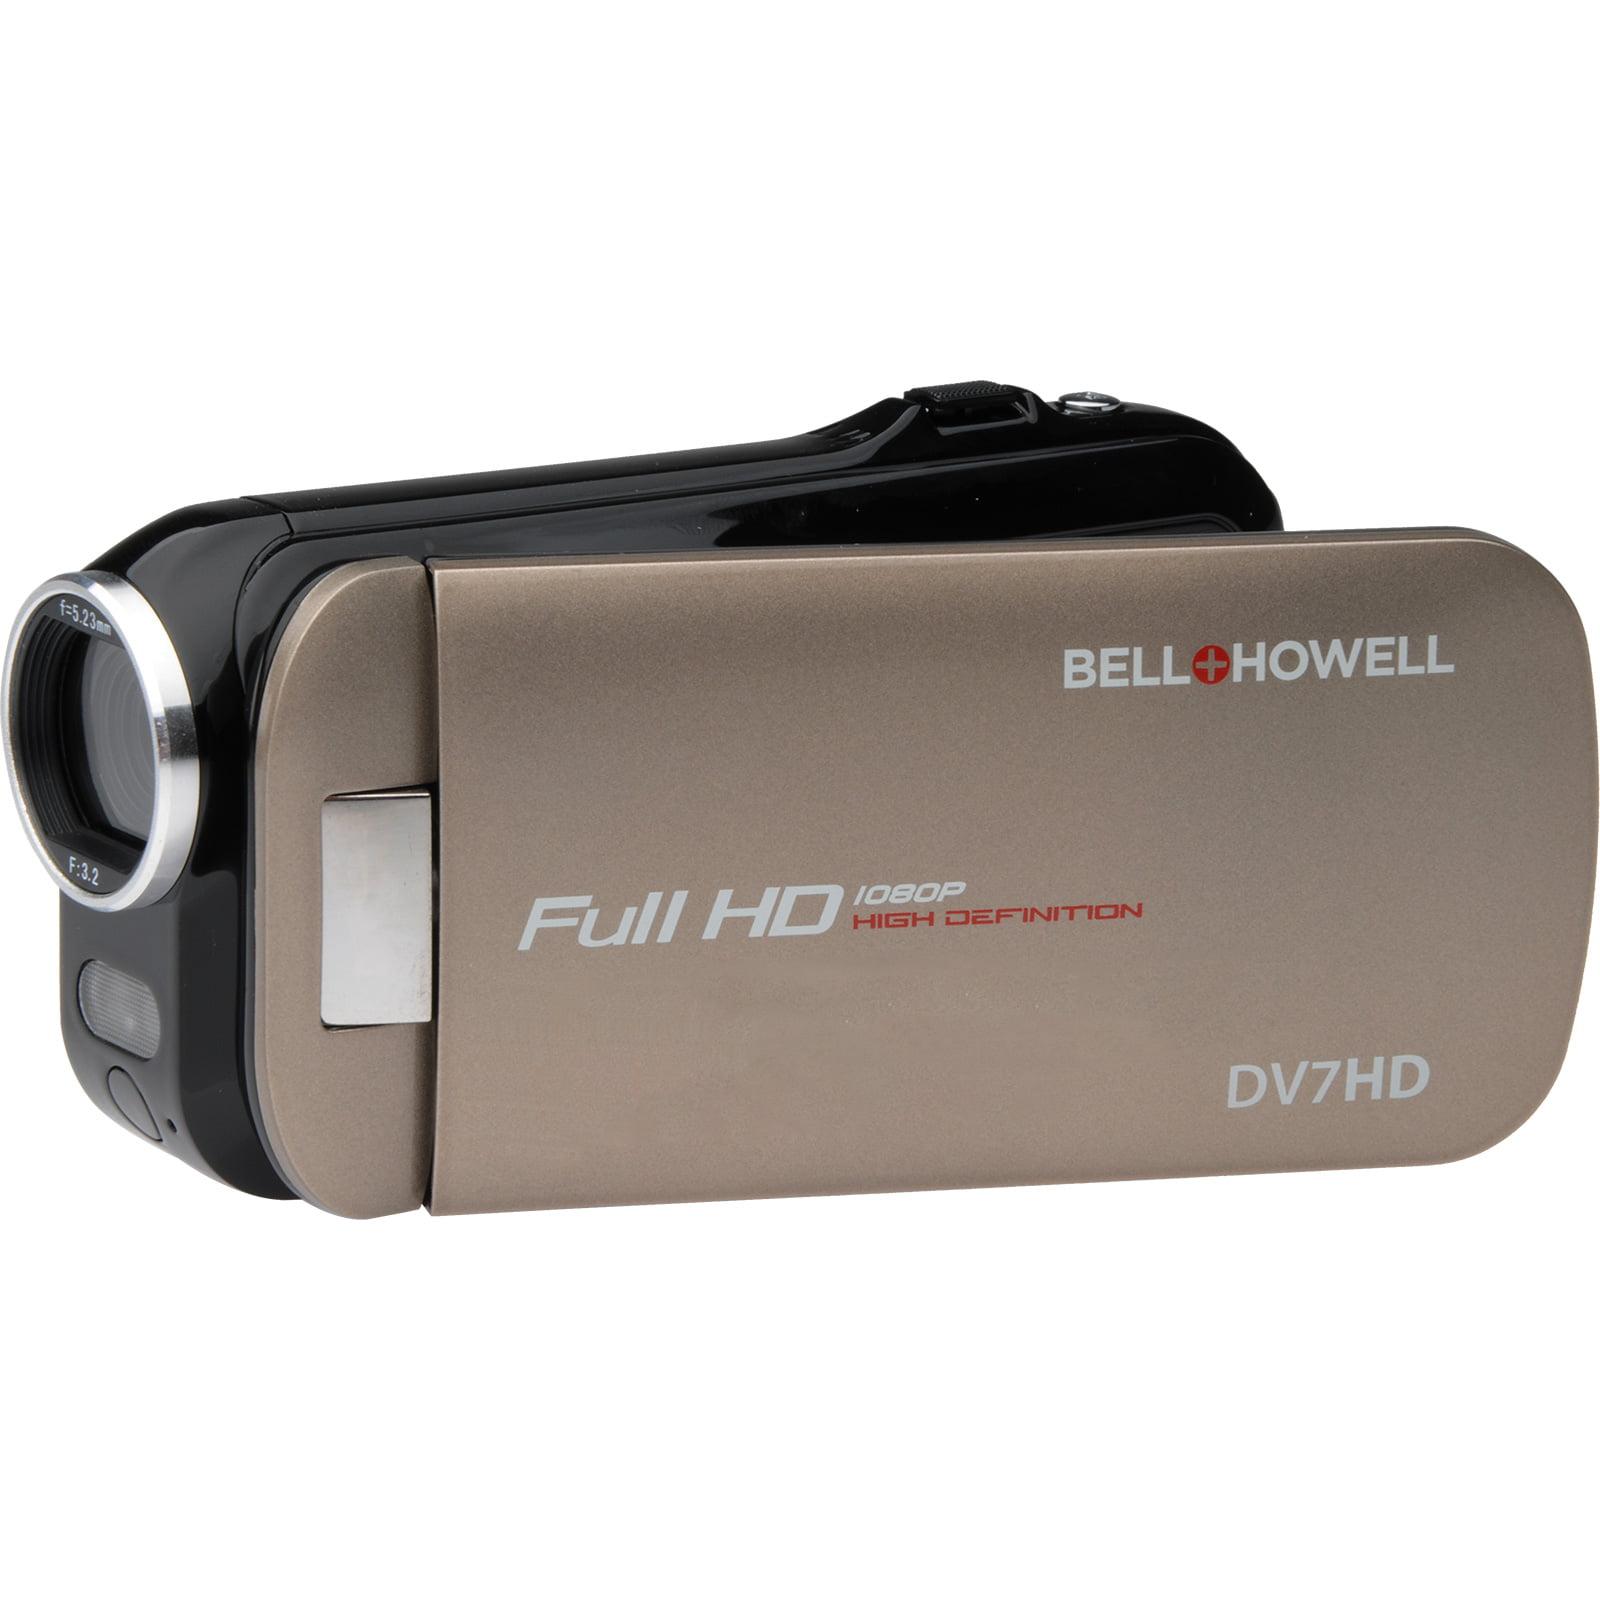 Bell & Howell Slice2 DV7HD 1080p HD Slim Video Camera Camcorder (Champagne)